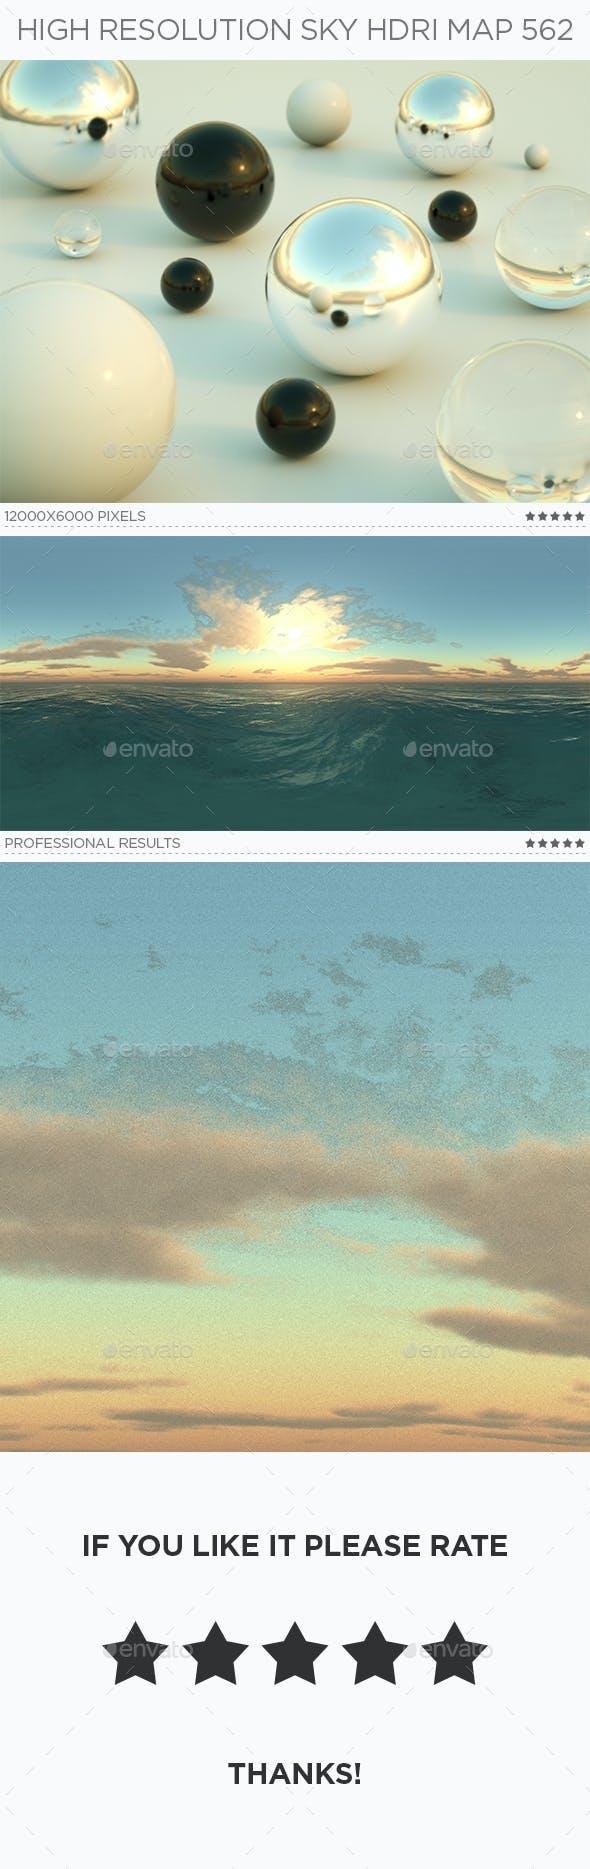 High Resolution Sky HDRi Map 562 - 3DOcean Item for Sale